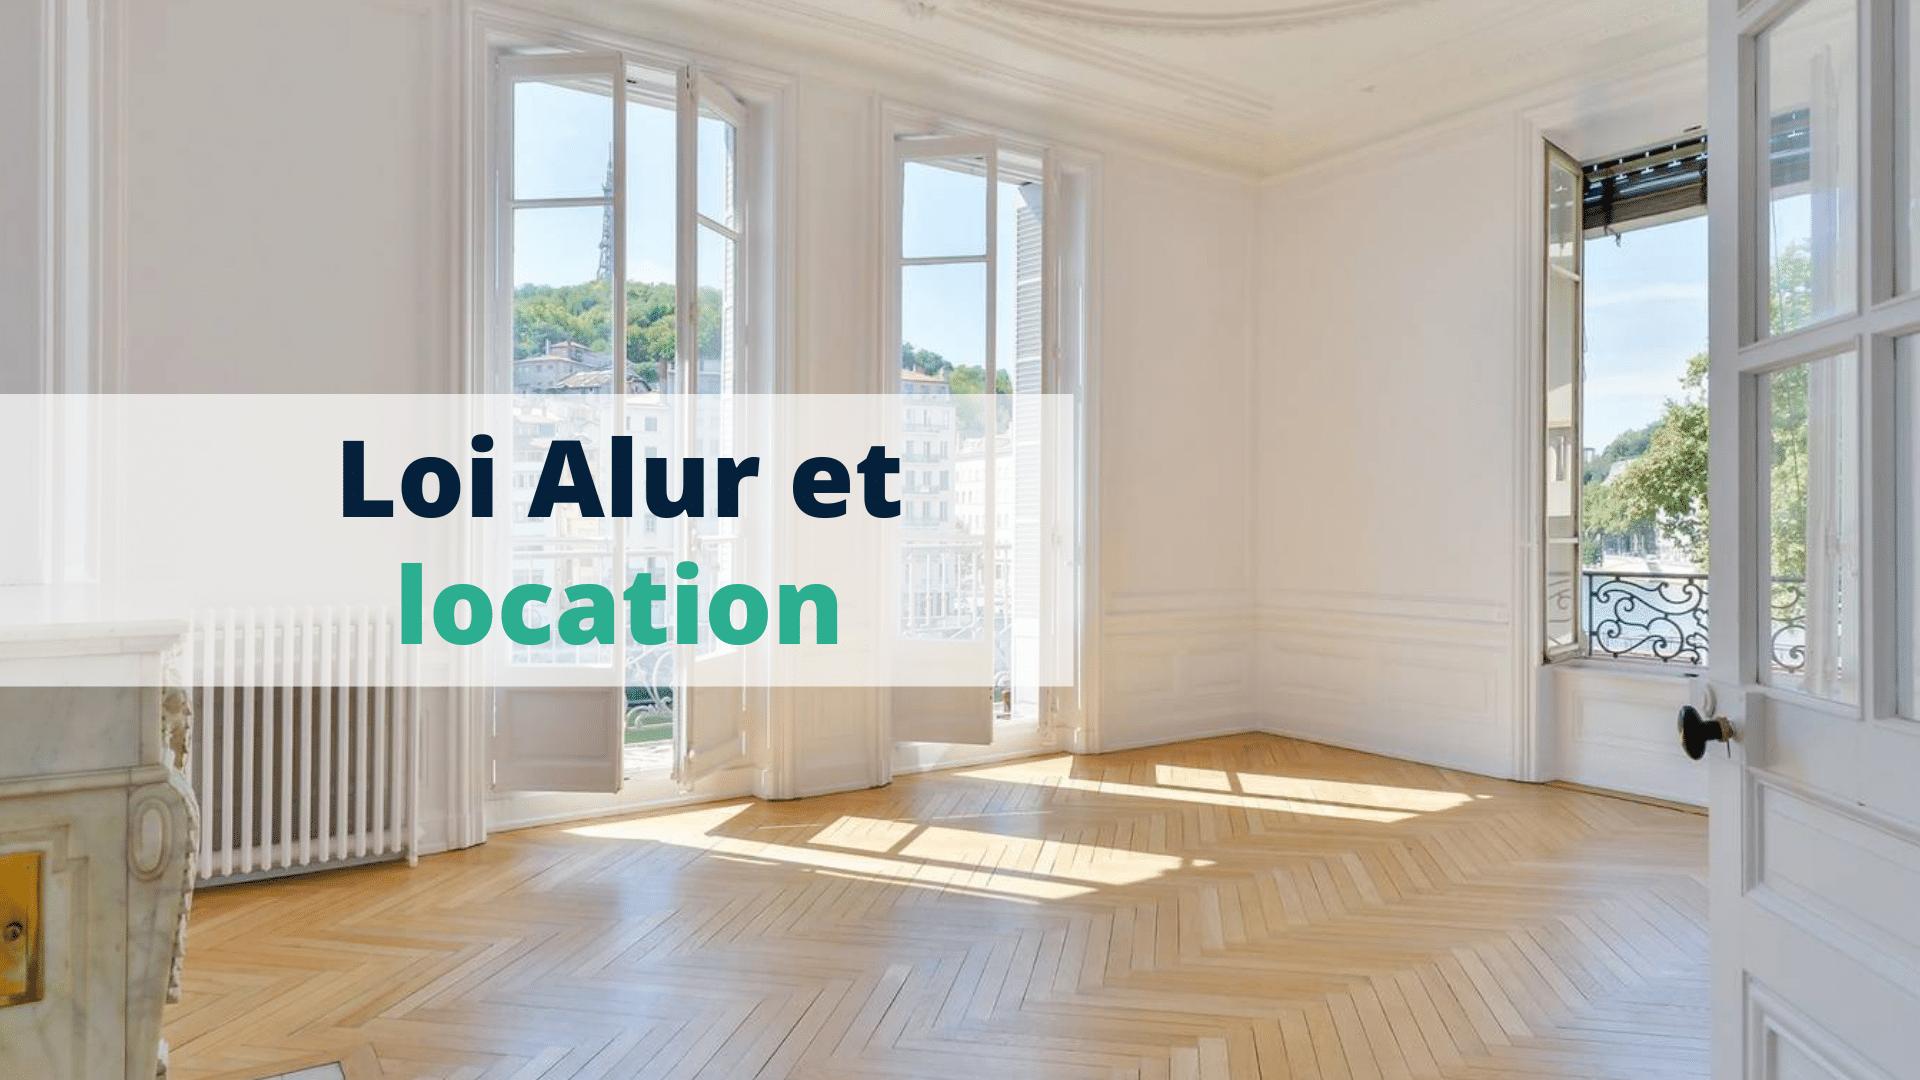 Loi Alur et location - Start Learning